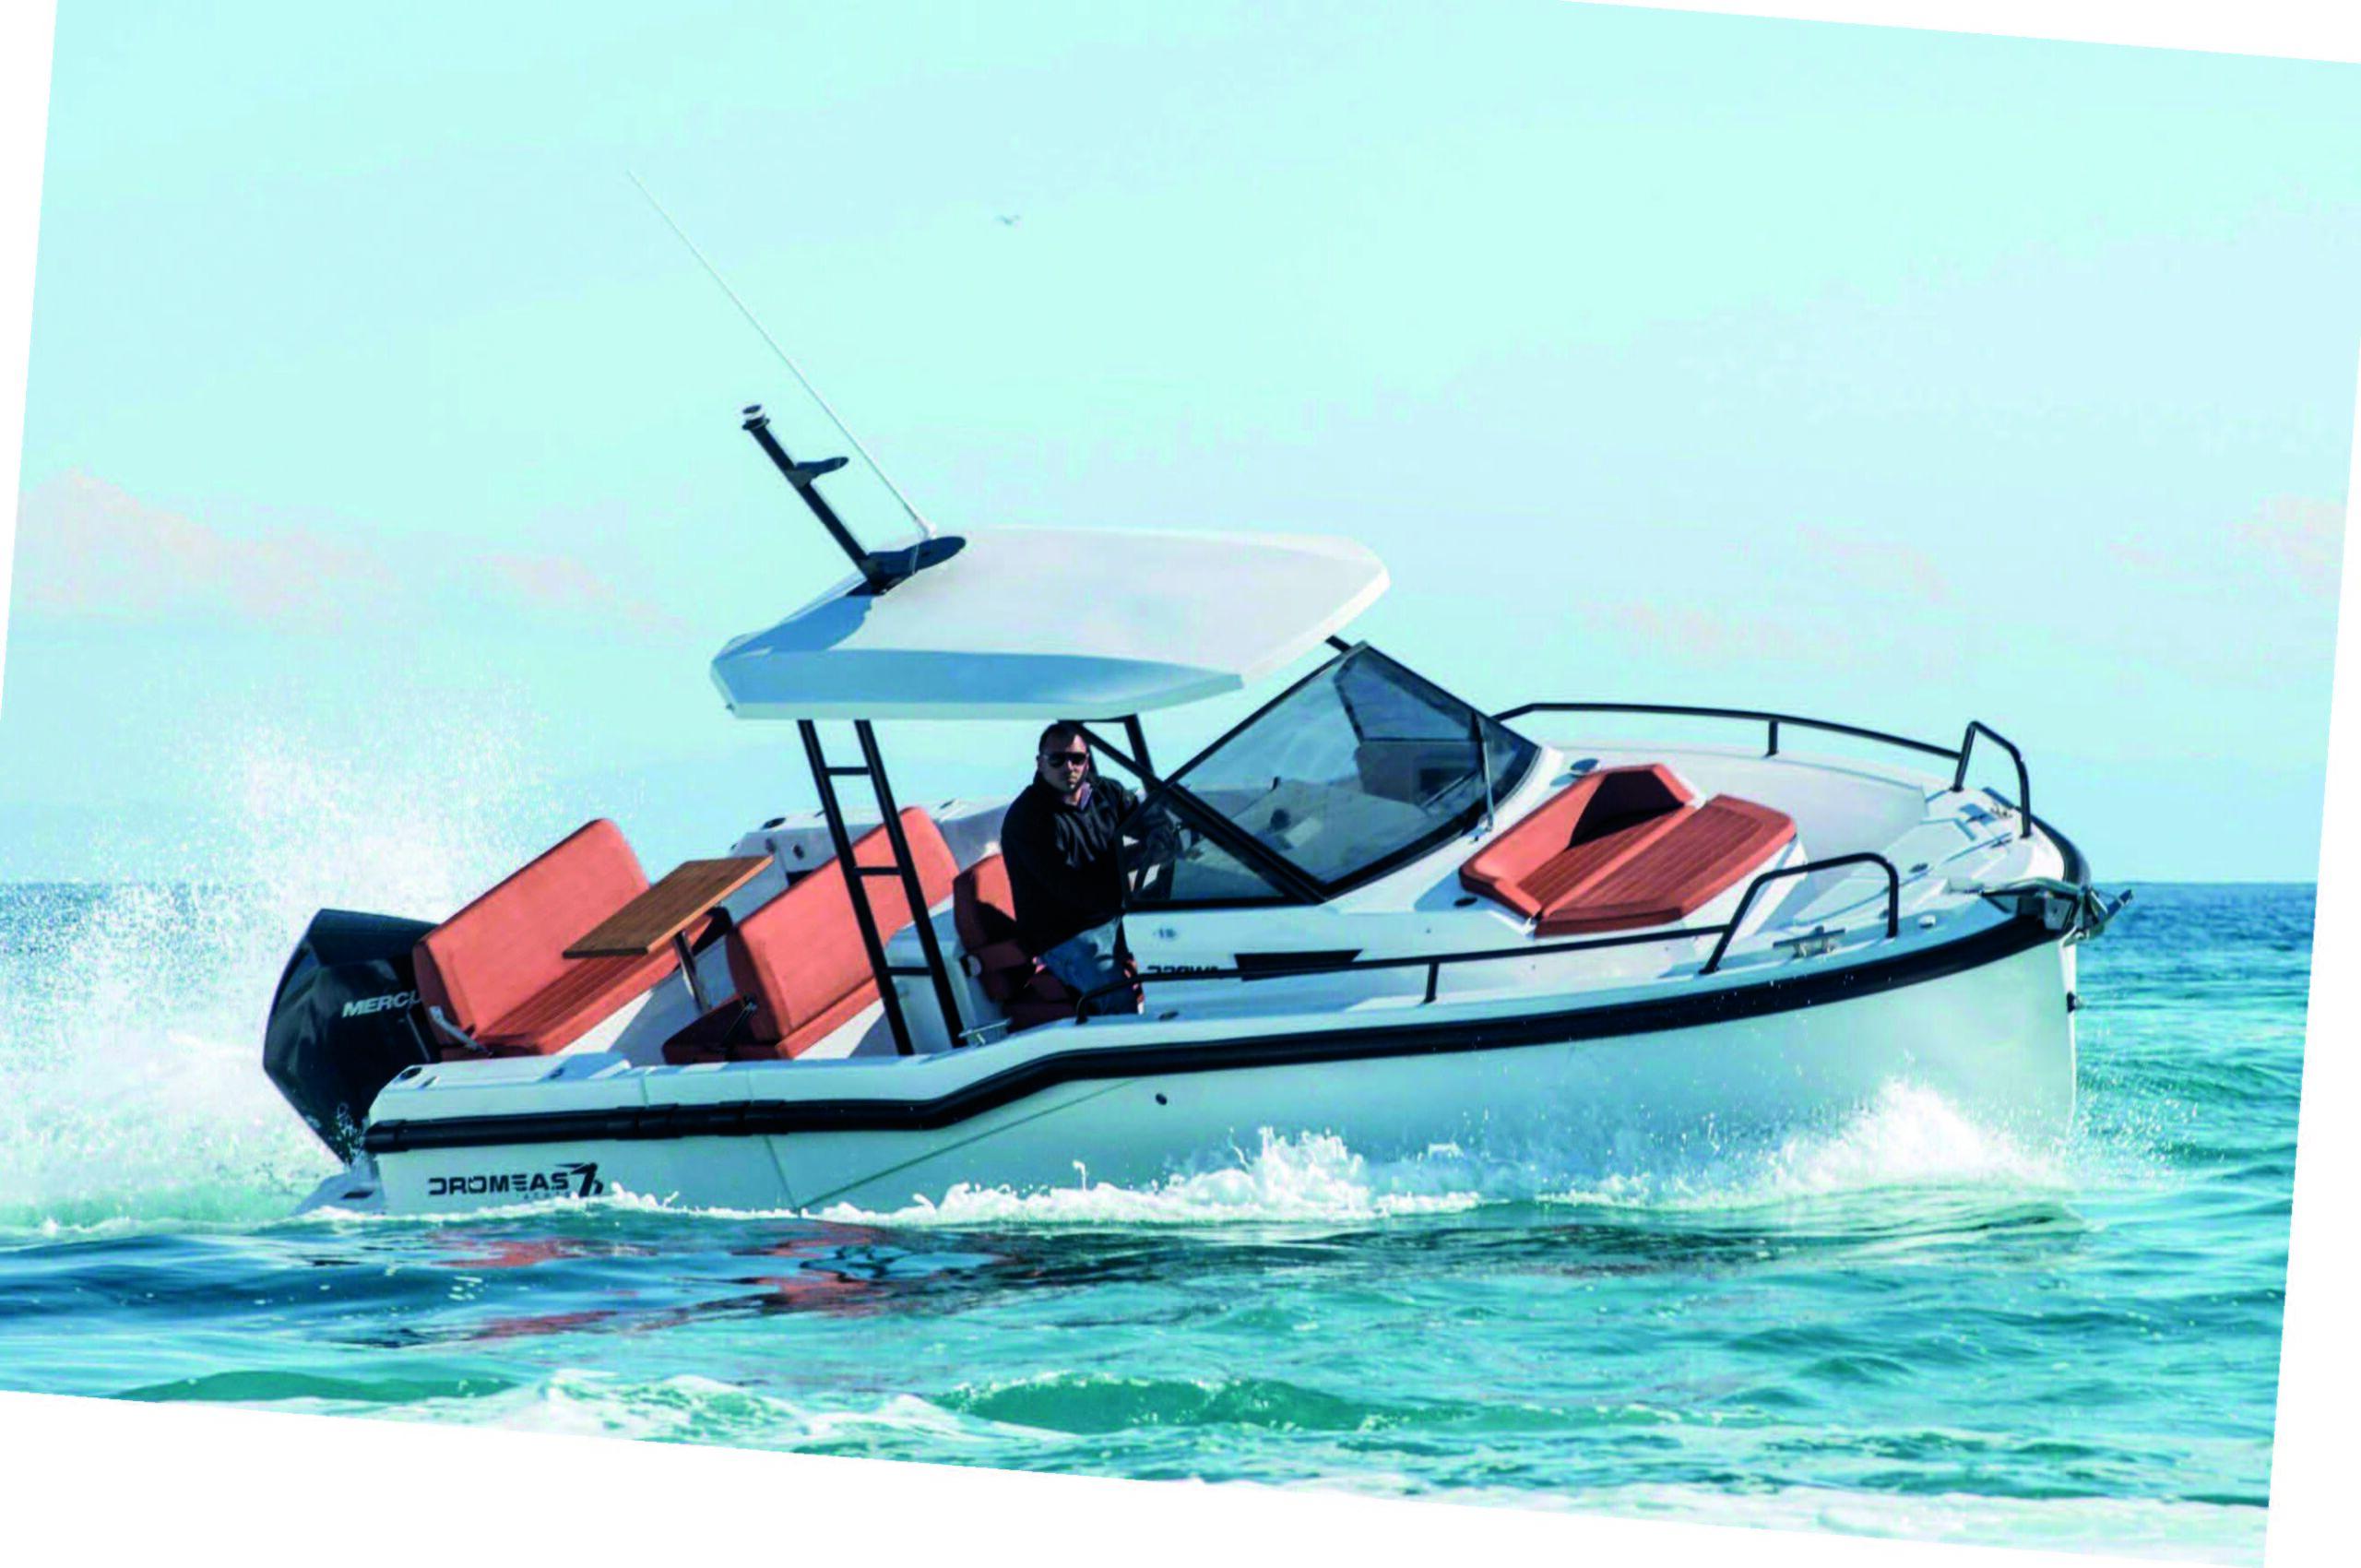 Dromeas Yachts